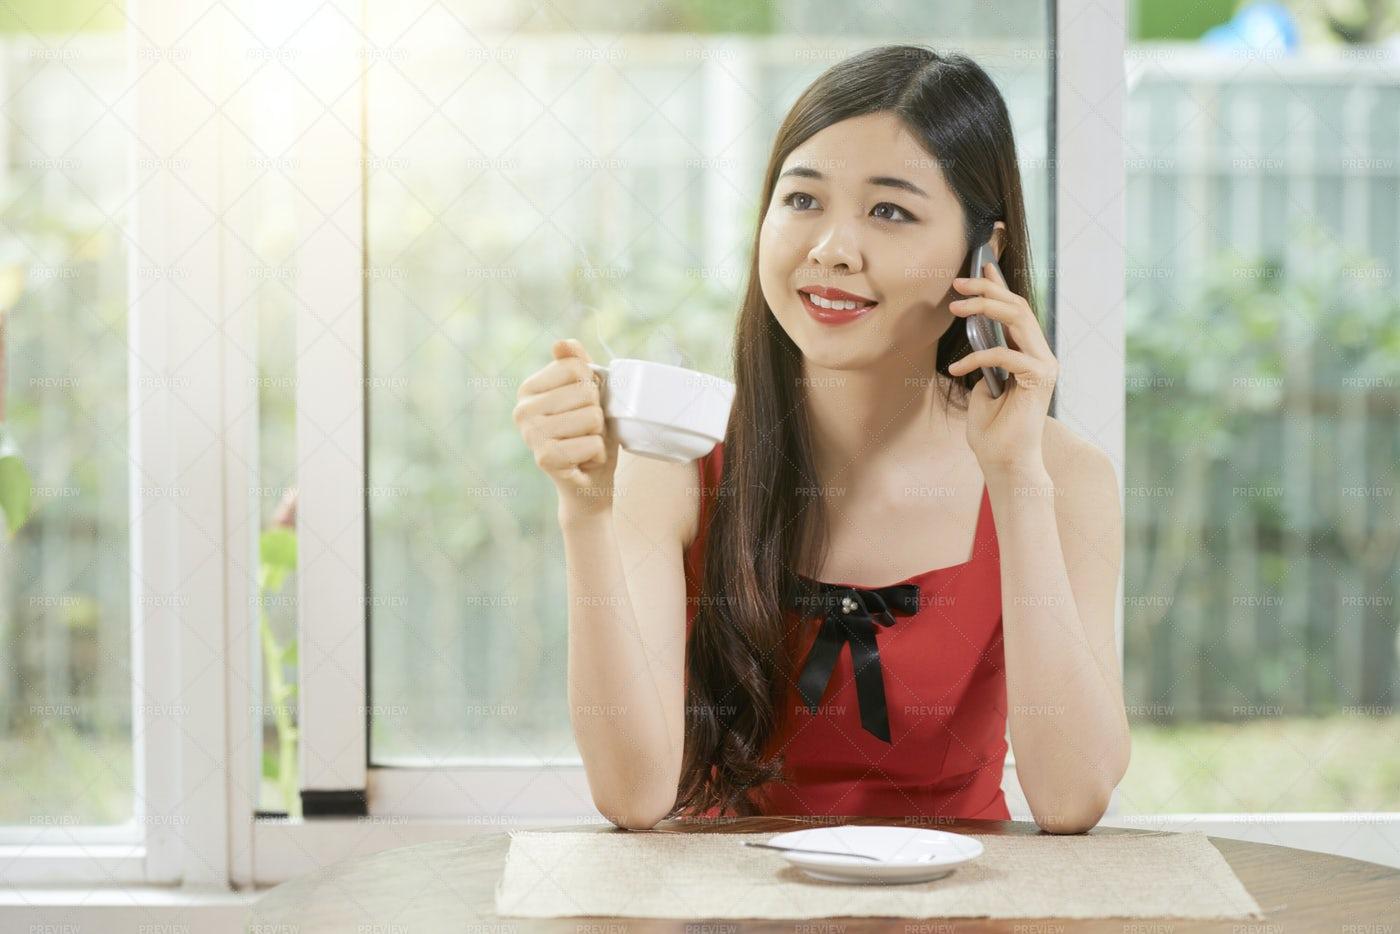 Woman Talking On Mobile Phone: Stock Photos